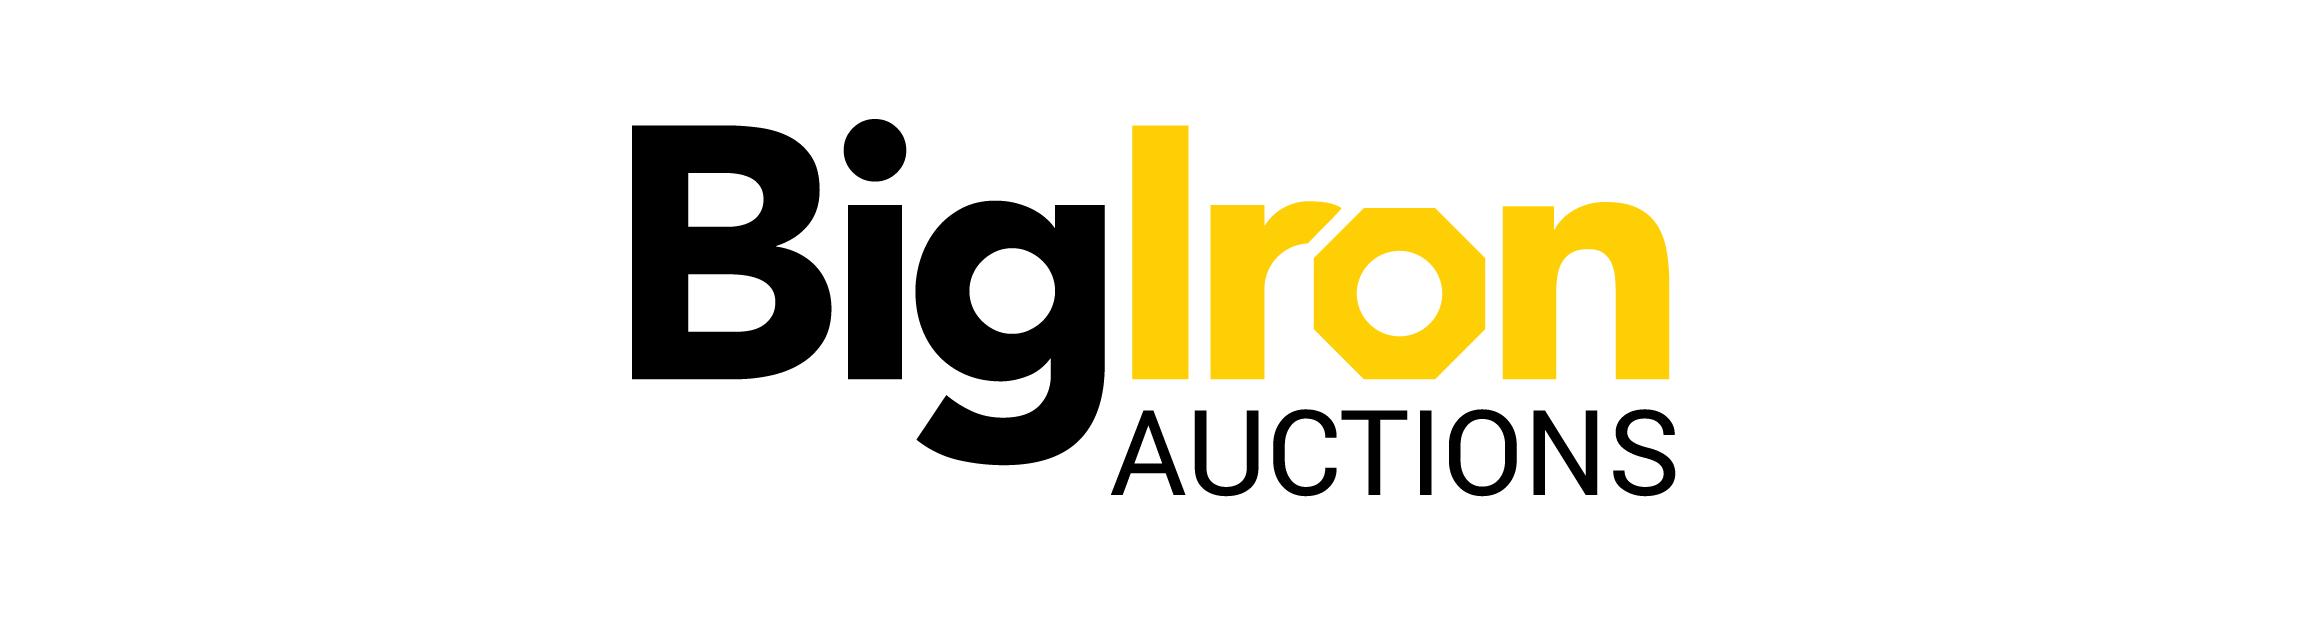 552x150-BigIron[4].png